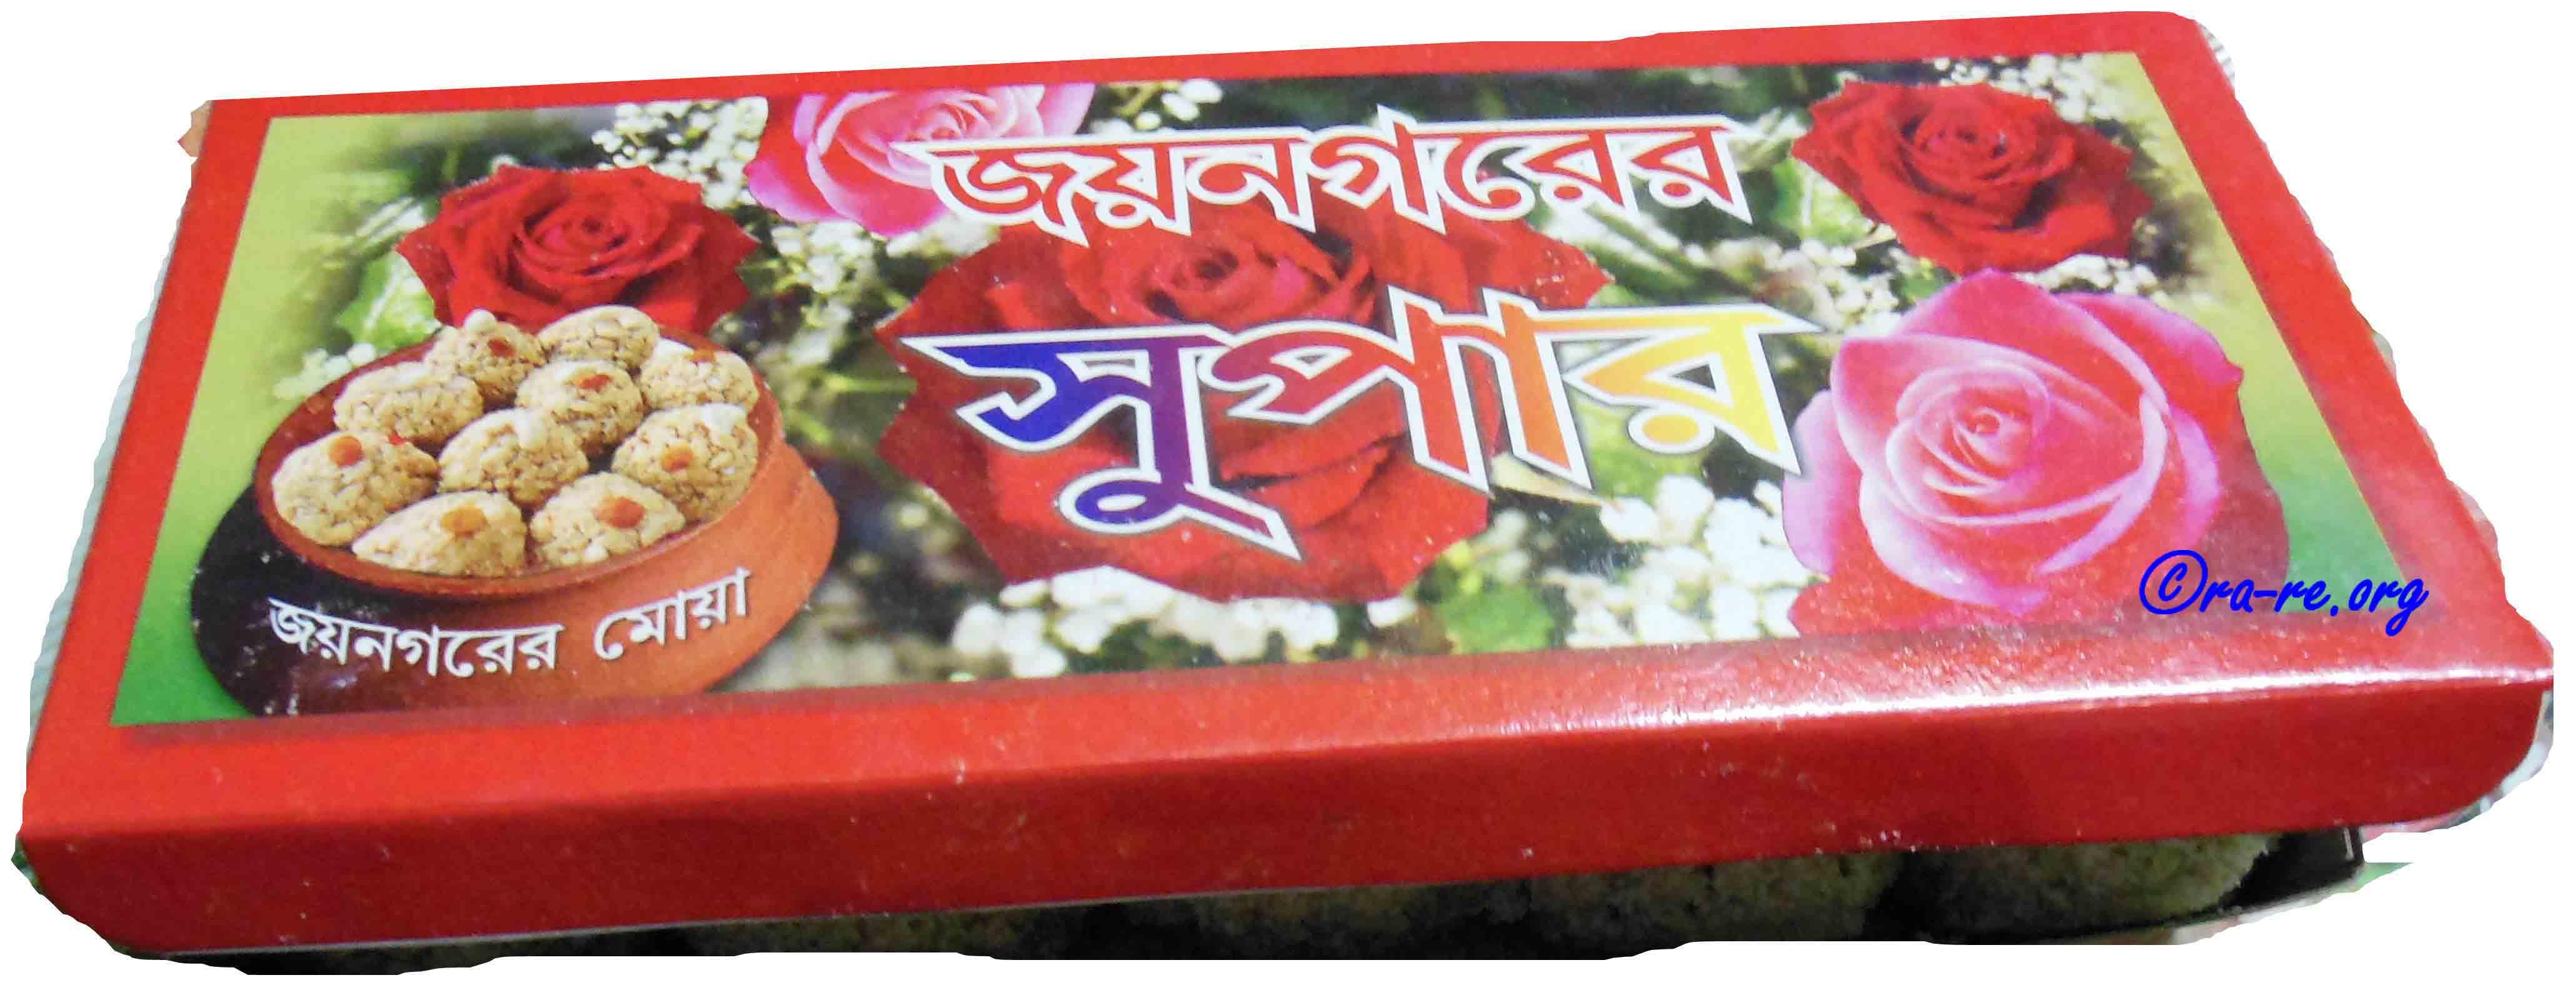 Joynagar-moa-packet-very-sweet